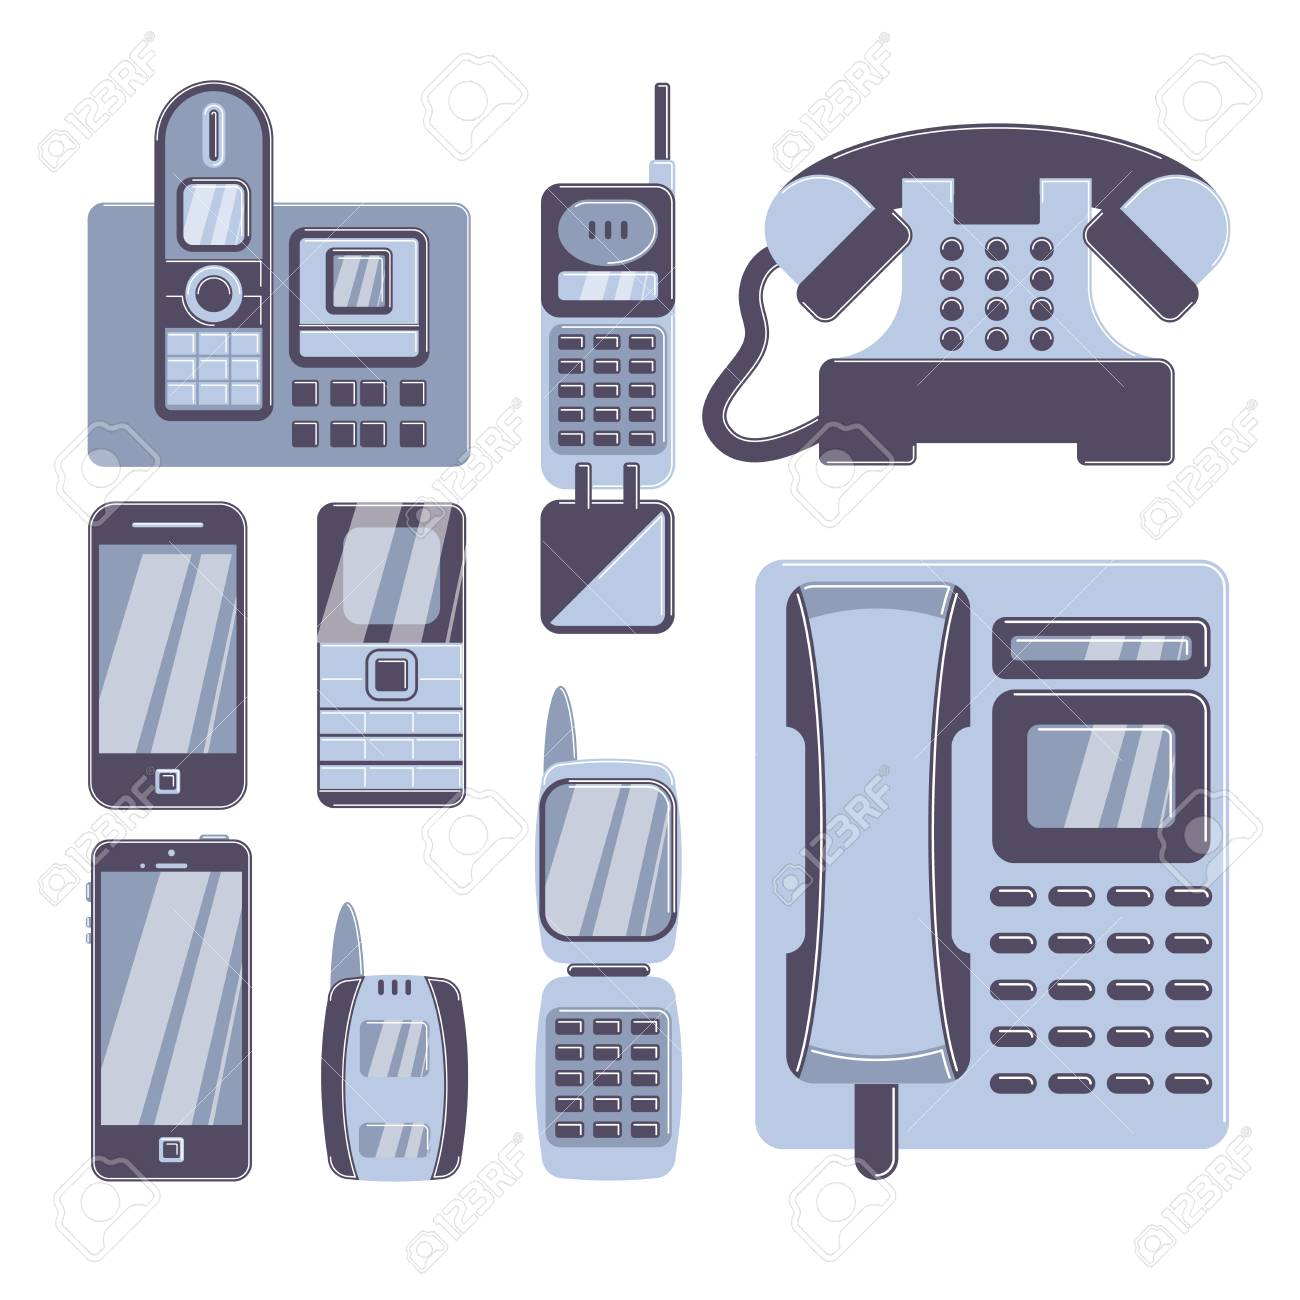 Retro phones set on white background. Folder phones, button phones and smartphones. - 70202399